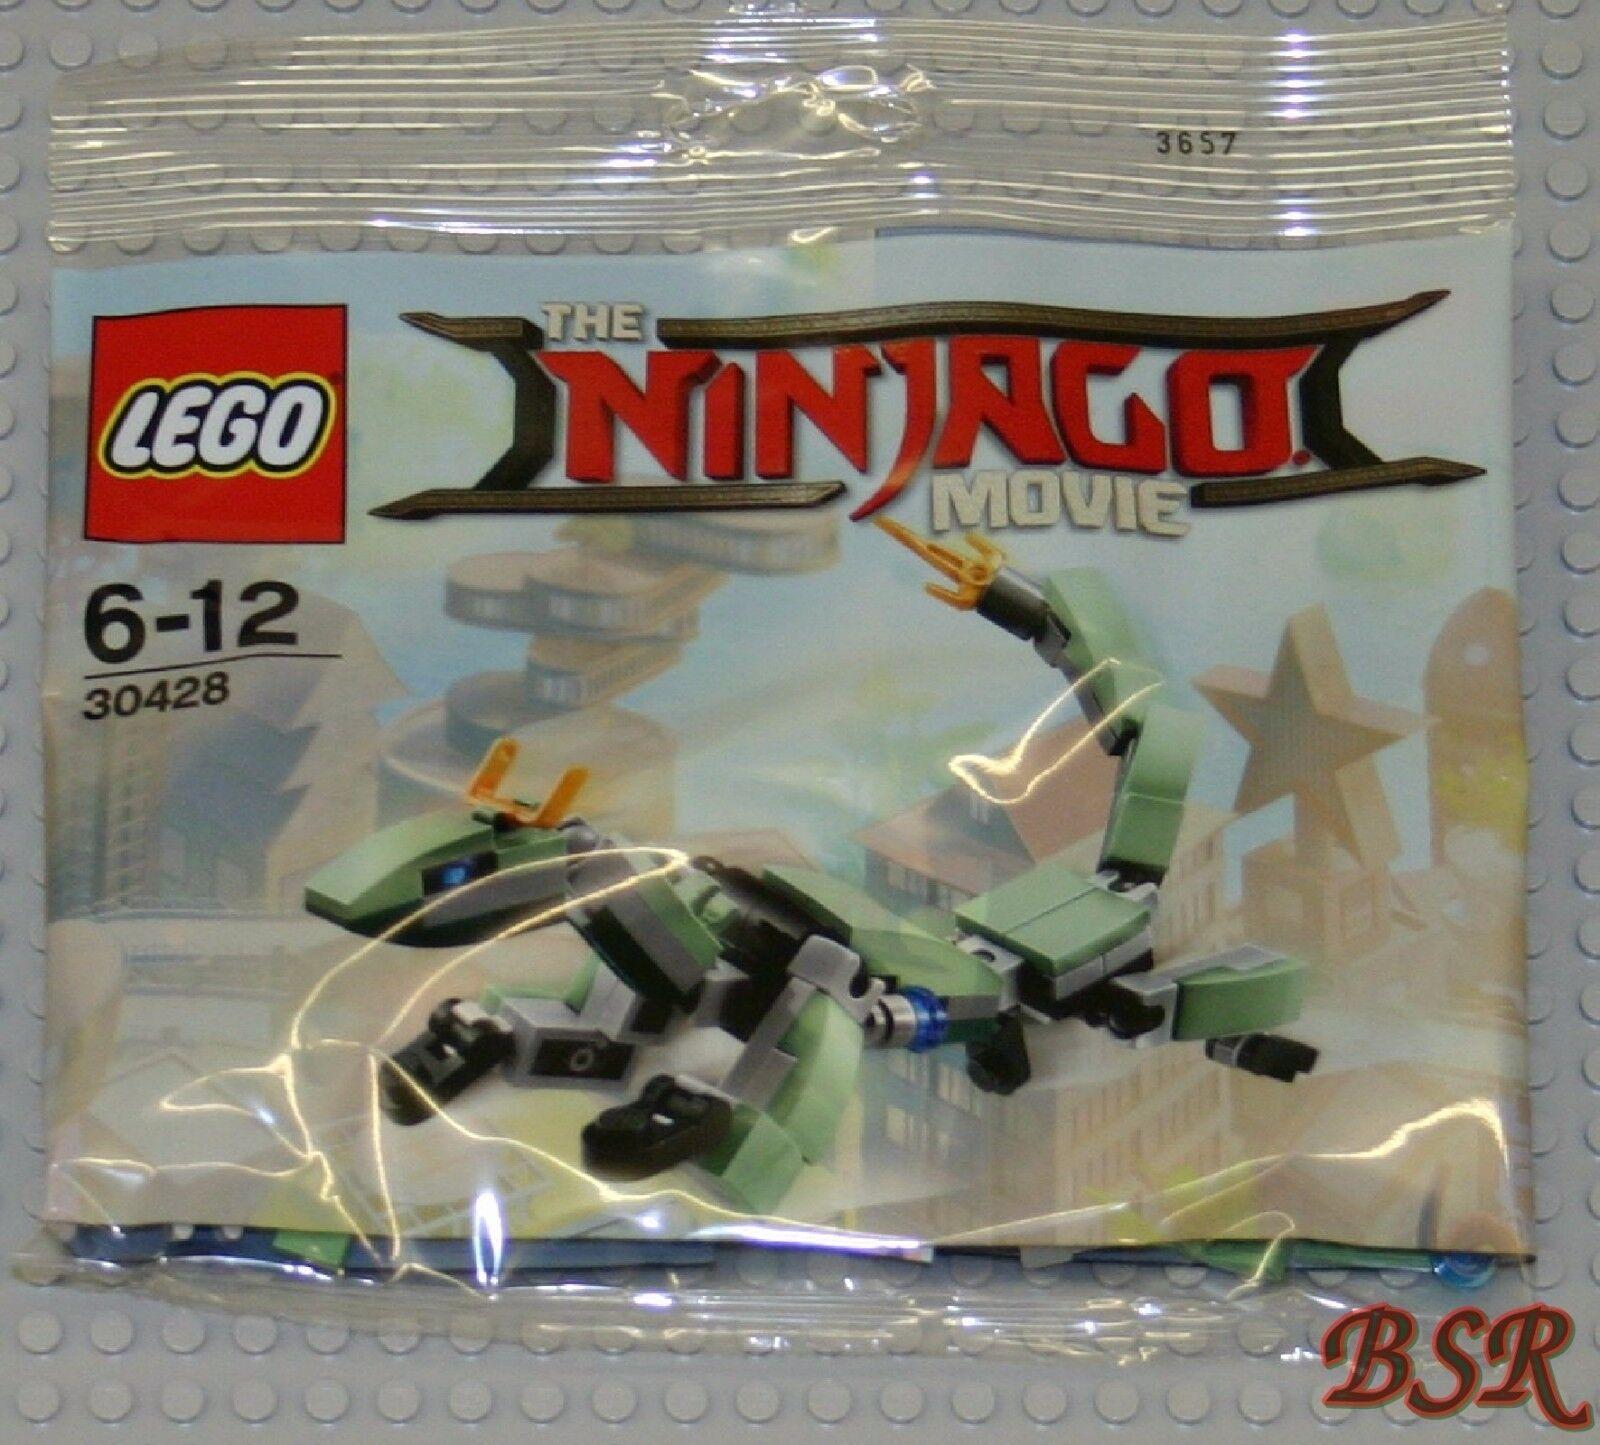 20x LEGO ® Ninjago Polysac   30428 Vert Ninja Mech Dragon Dragon  NOUVEAU & NEUF dans sa boîte  À ne pas manquer!